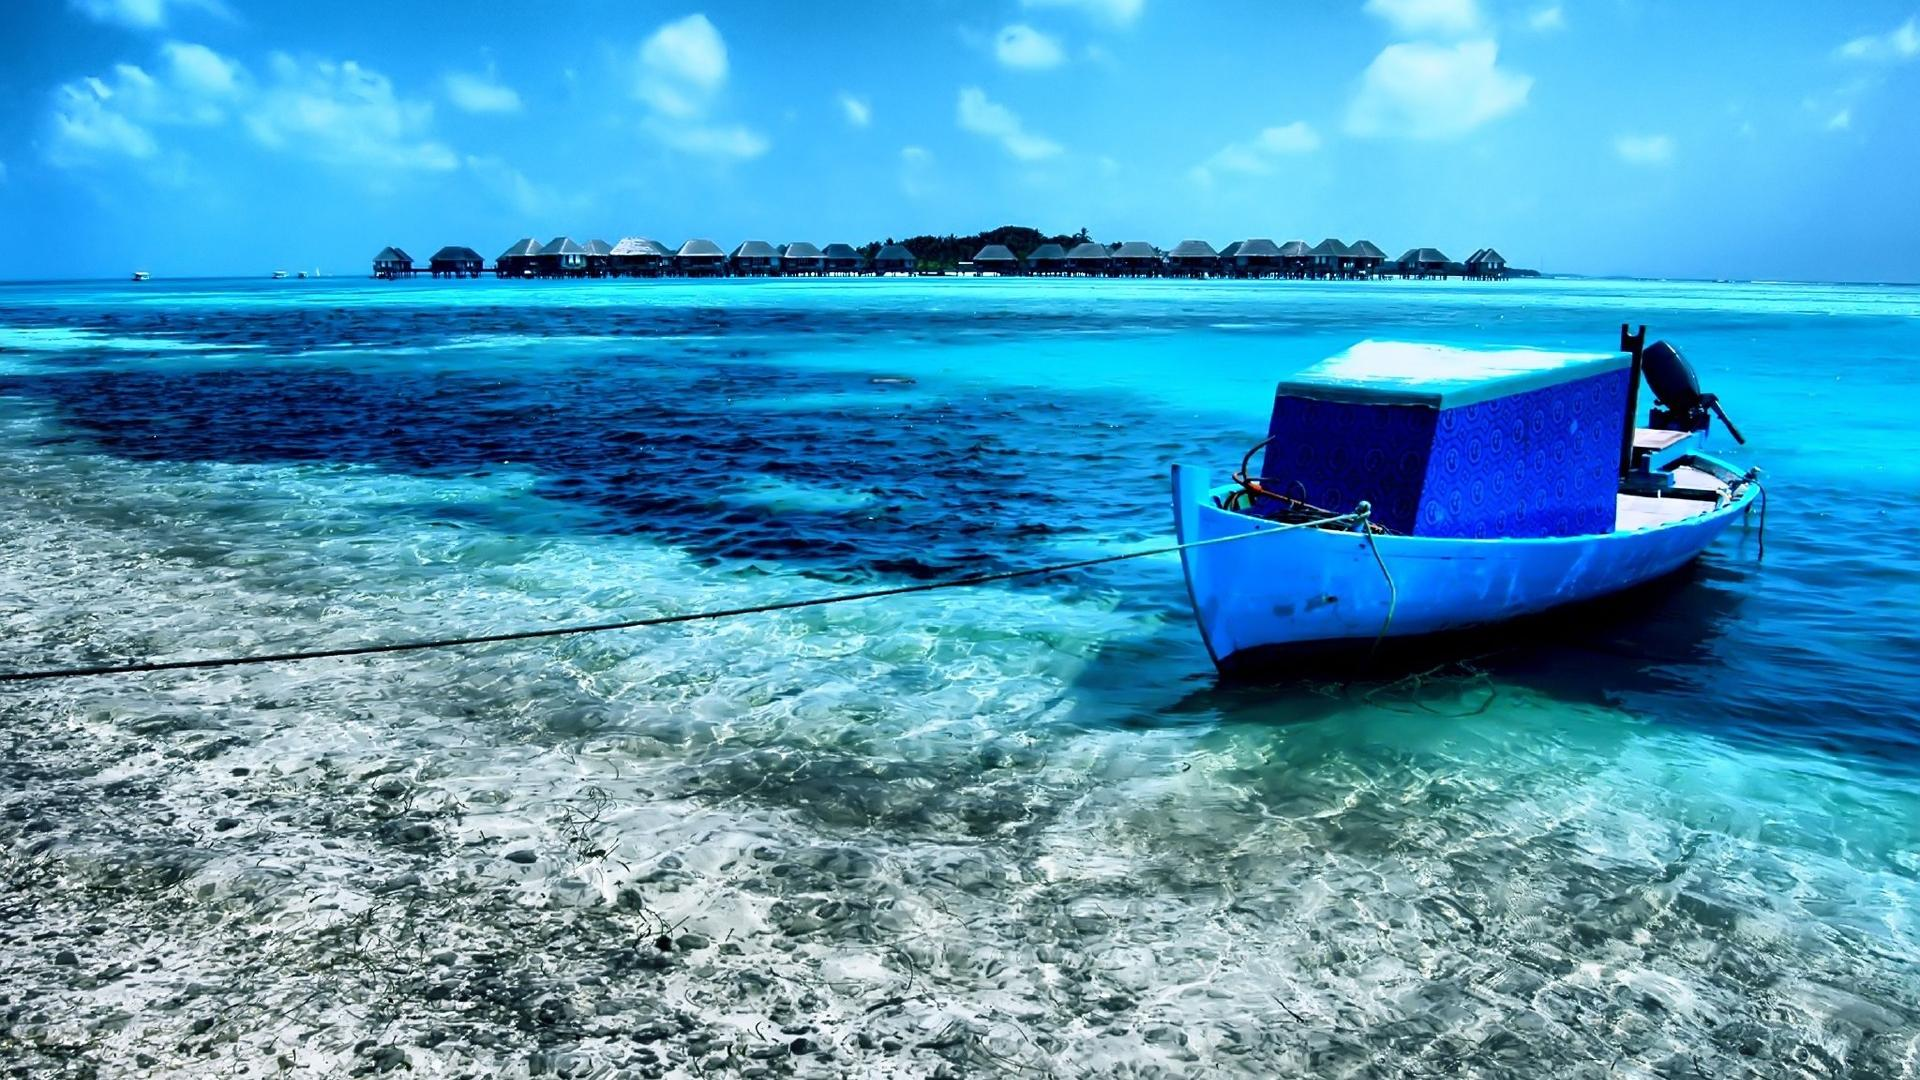 Maldives Beach Hd Wallpaper: [36+] Maldives HD Wallpaper On WallpaperSafari